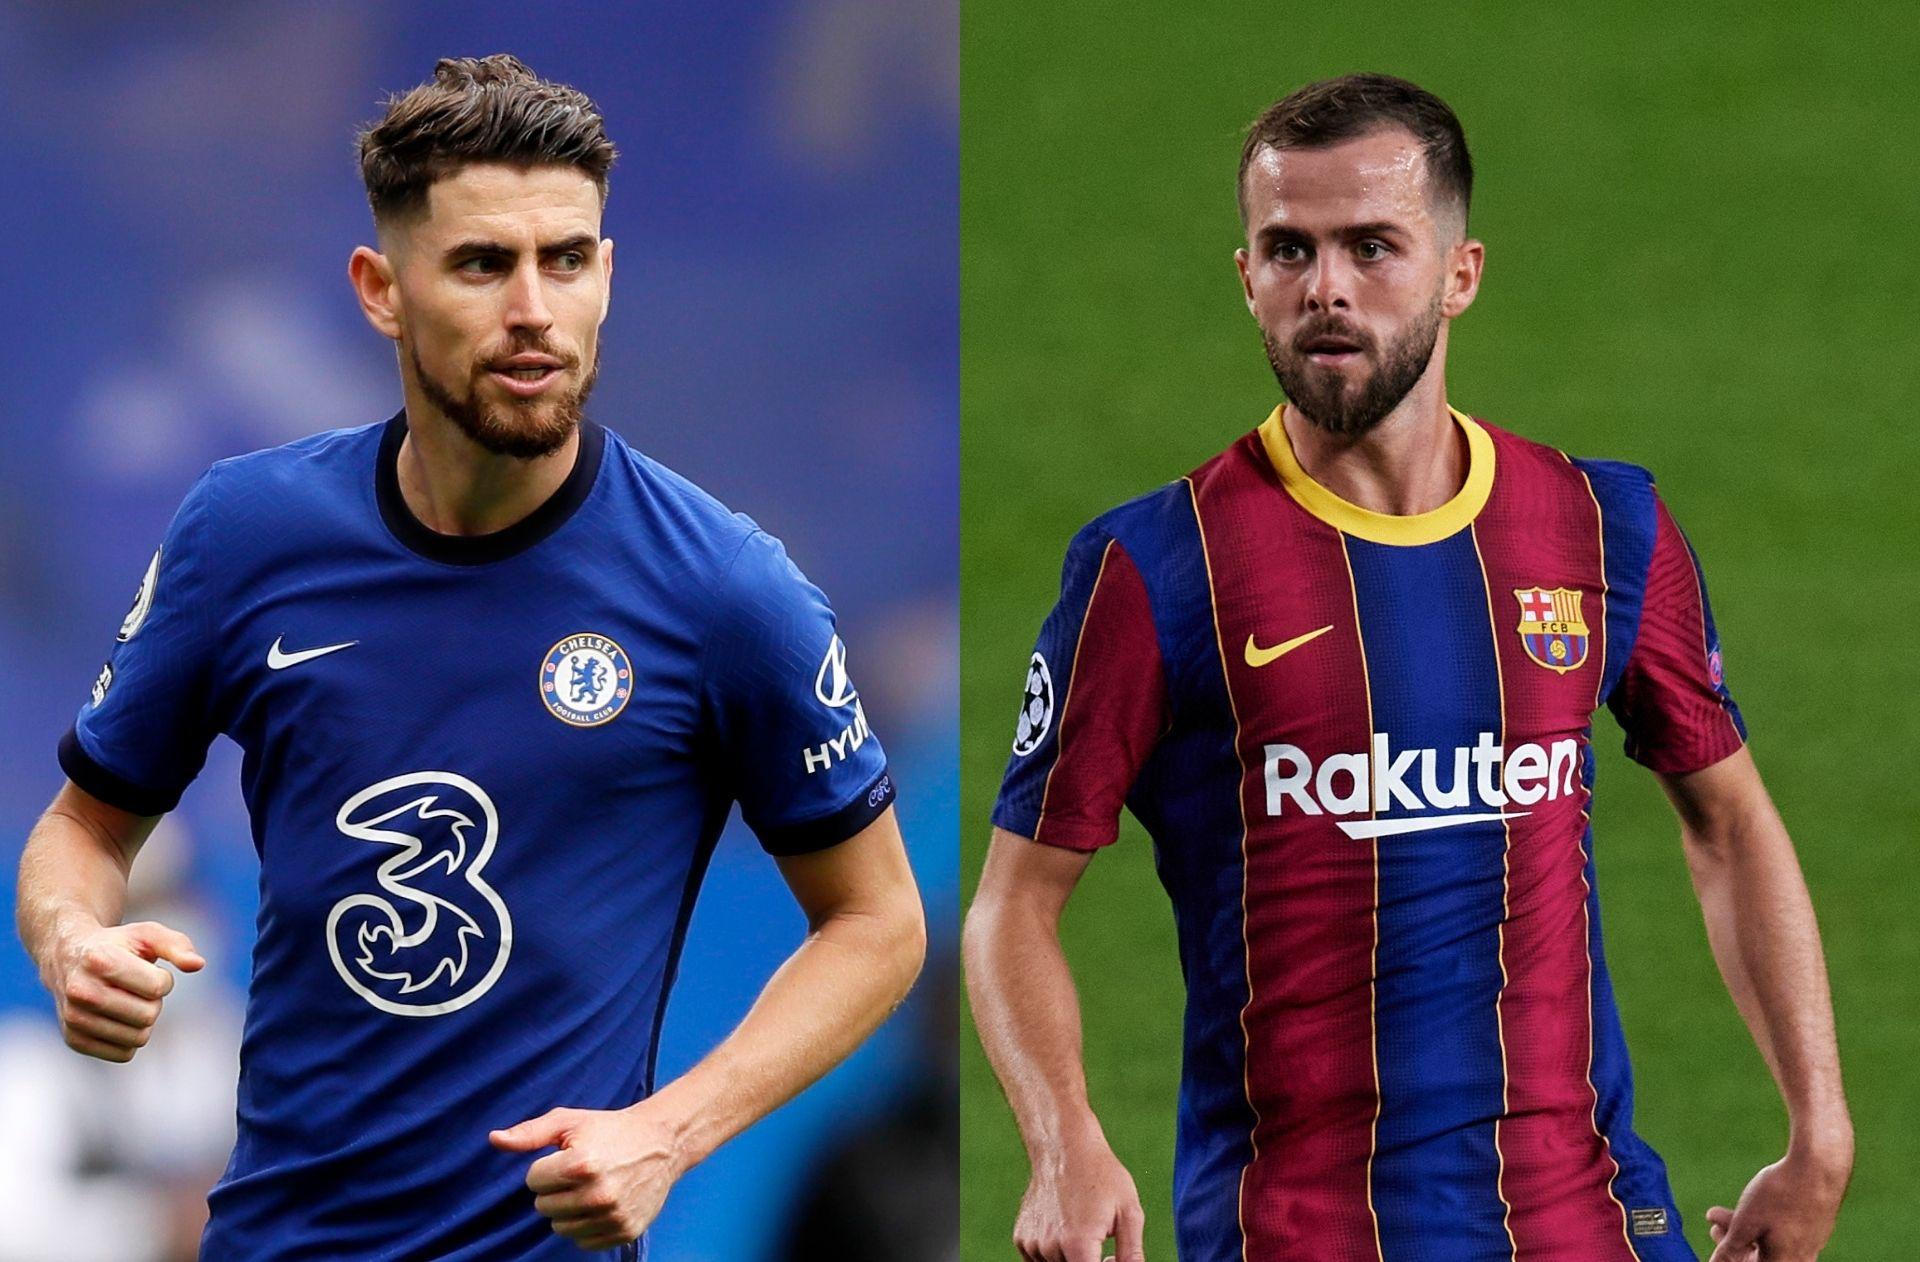 Jorginho - Chelsea, Pjanic - Barcelona